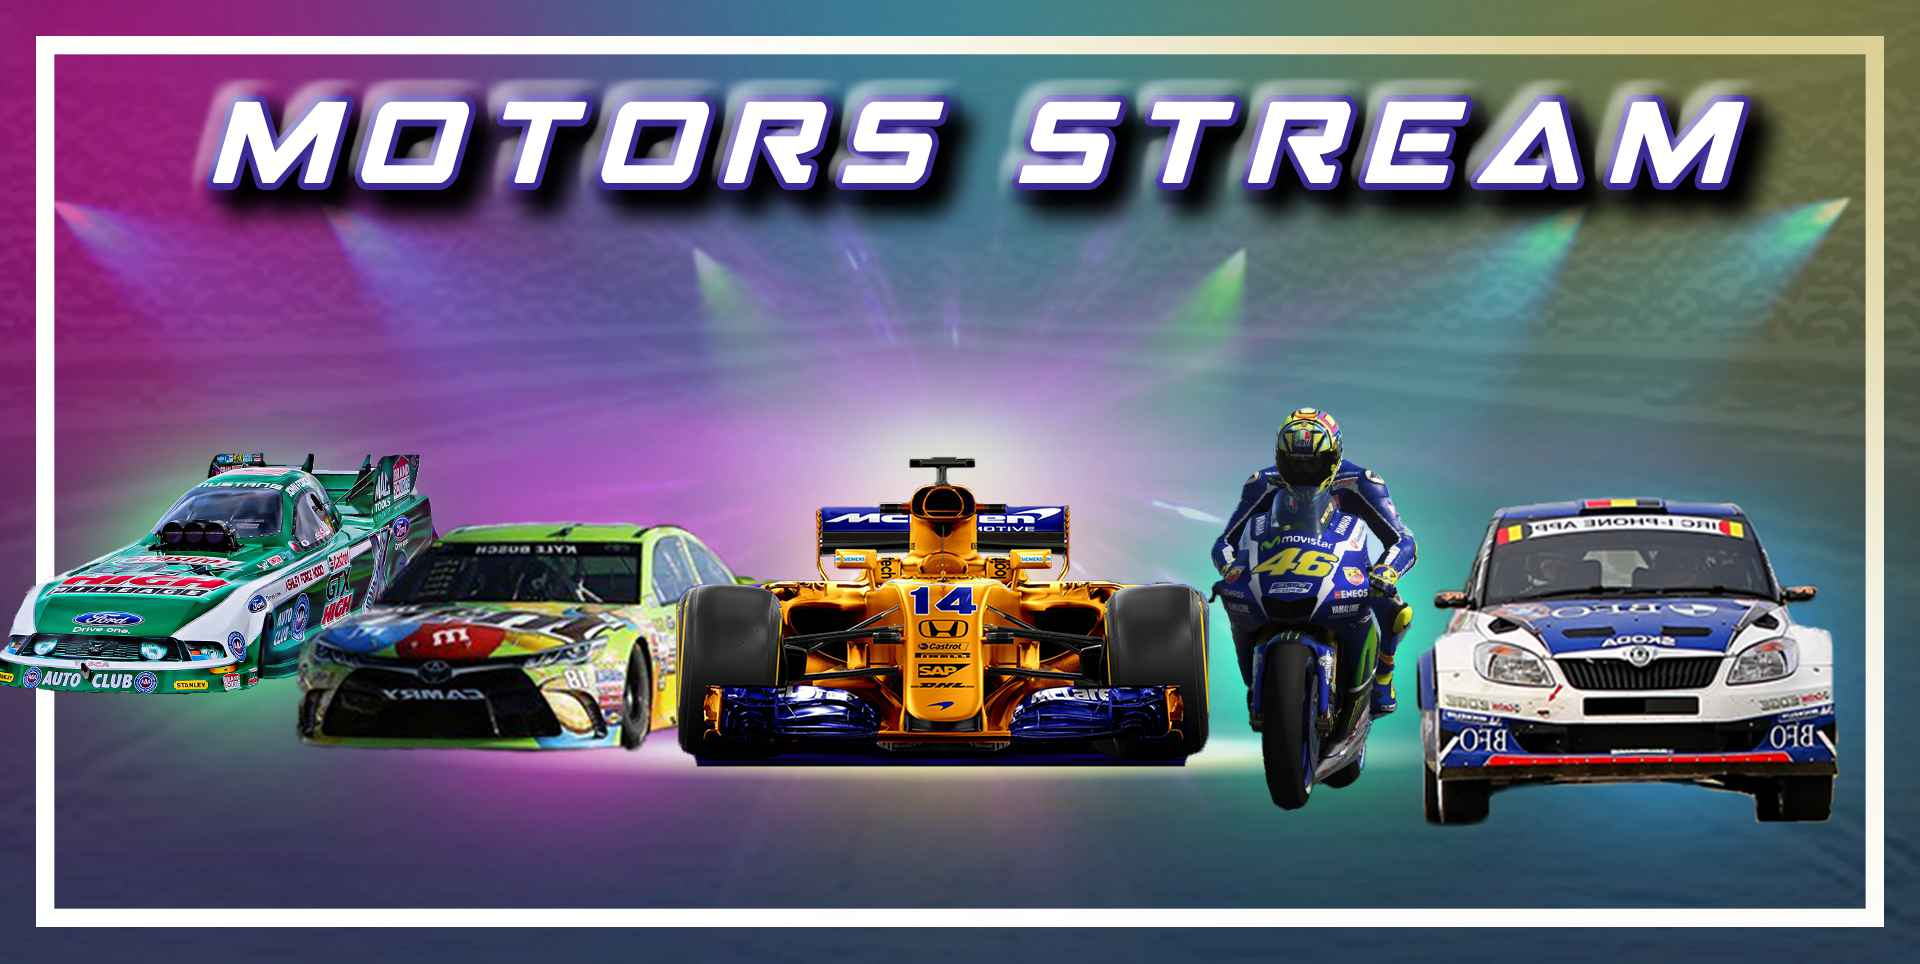 2017 NHRA Mello Yello Drag Racing Series Fixtures